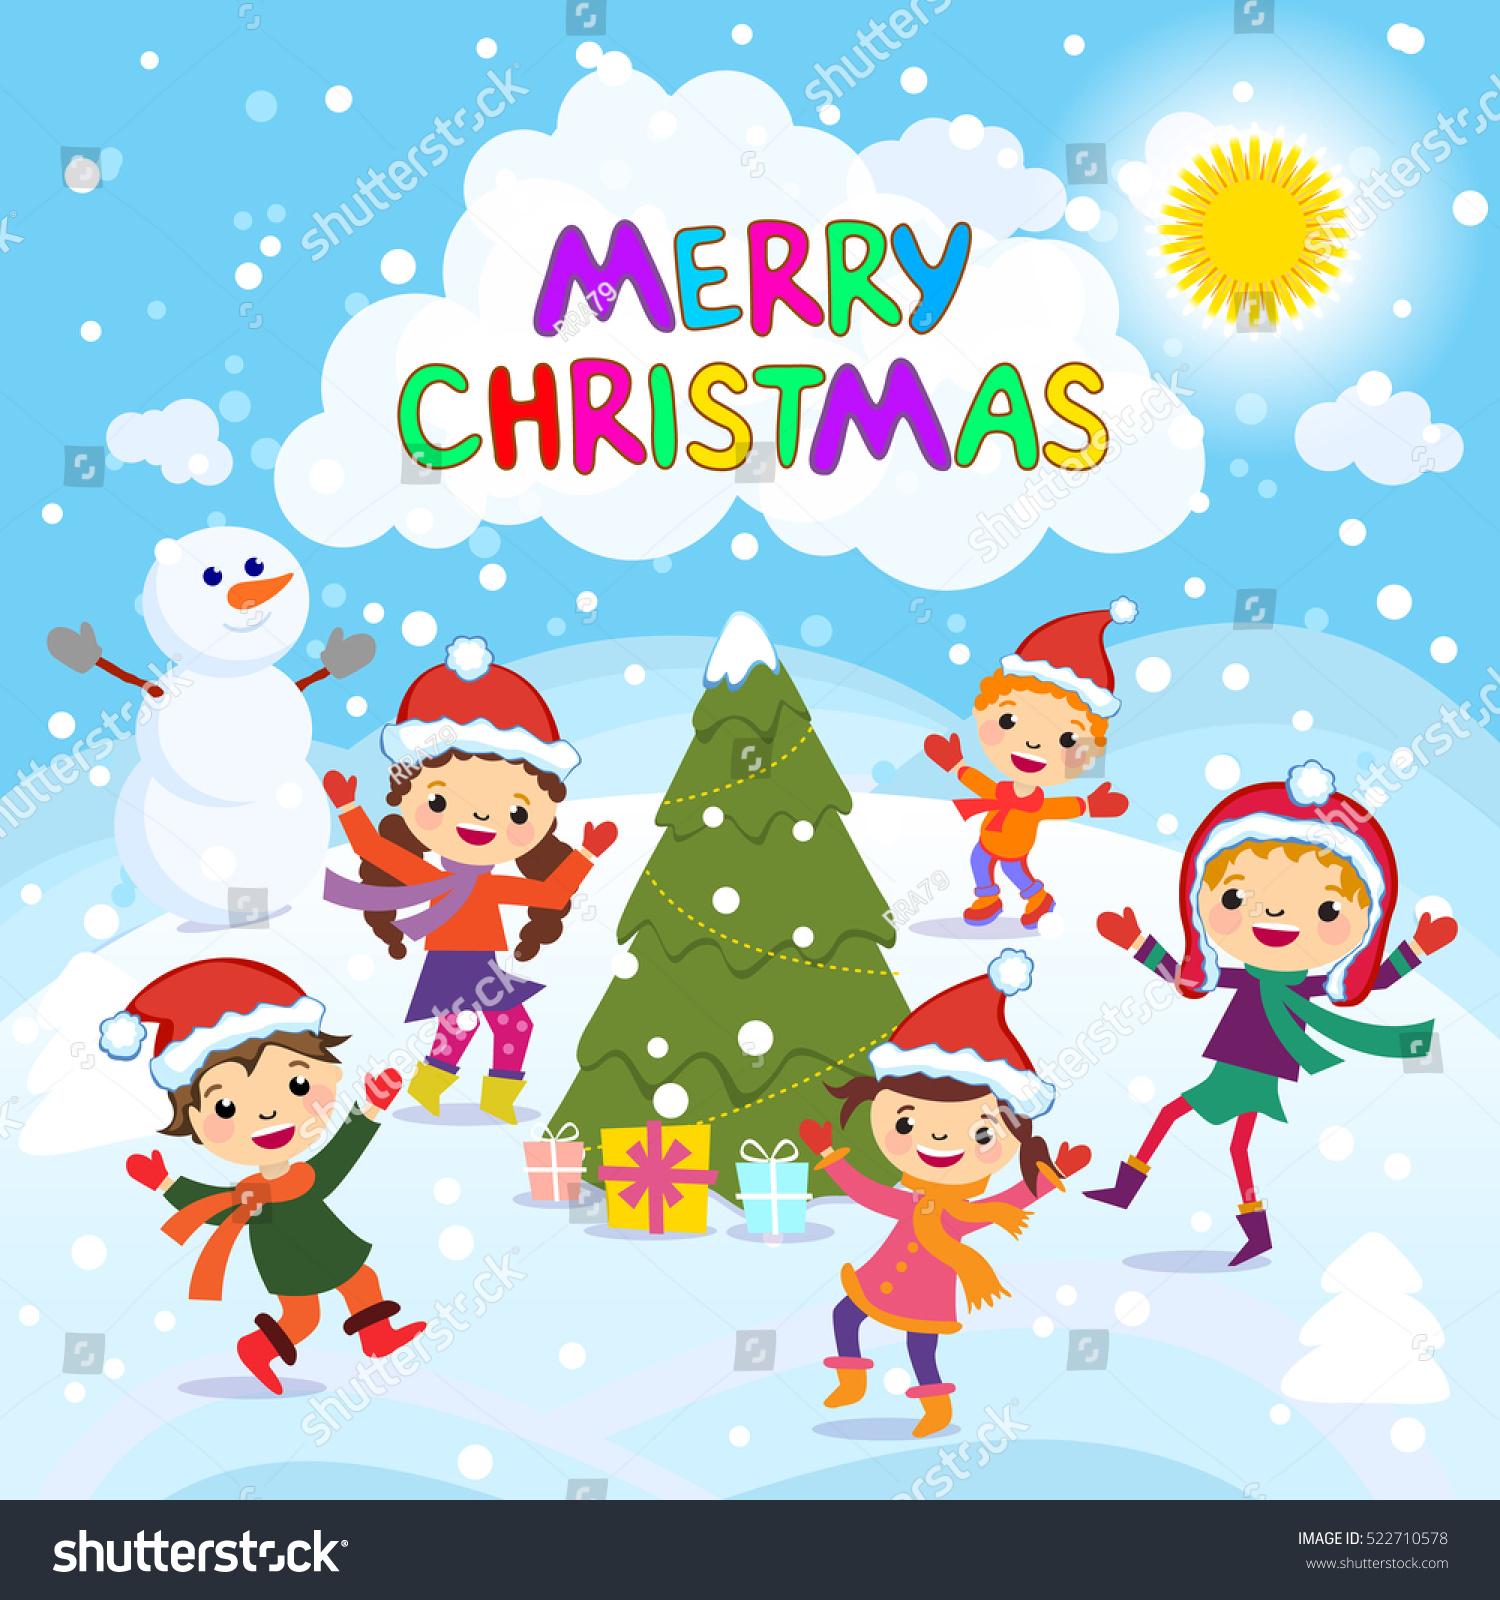 Merry Christmas Winter Fun Cheerful Stock Vector